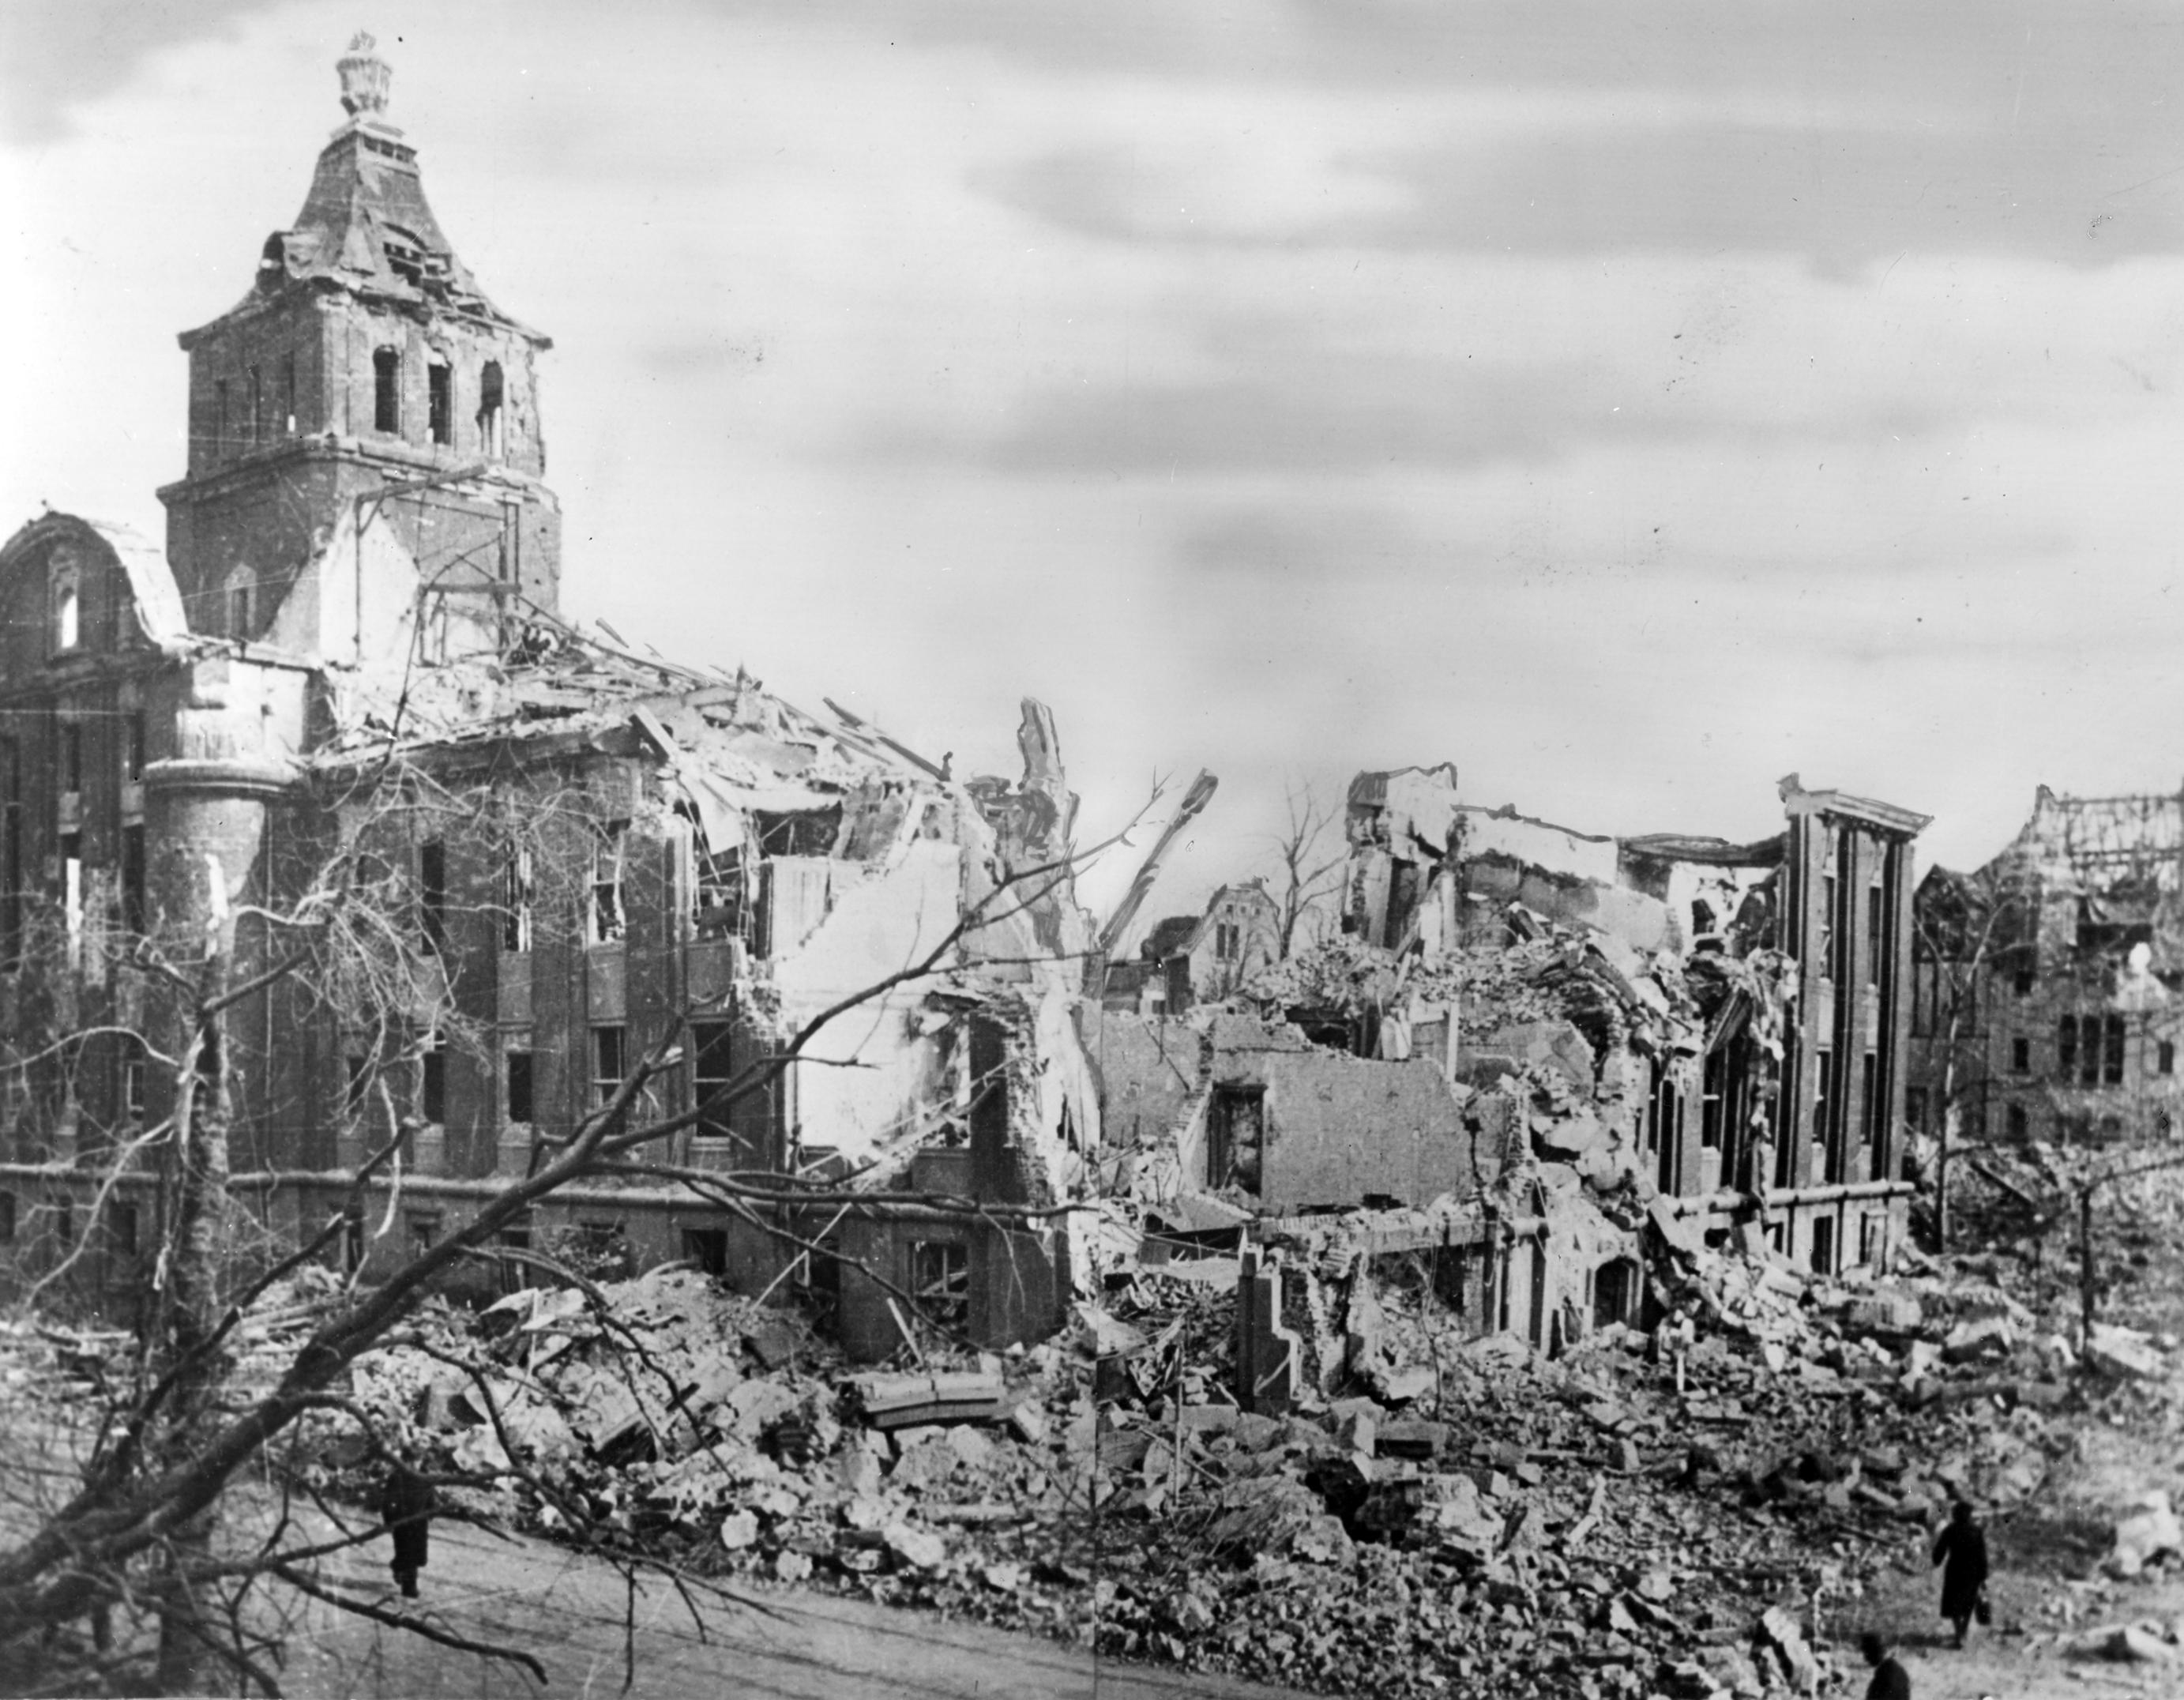 Essen Emscherhaus zerstört II